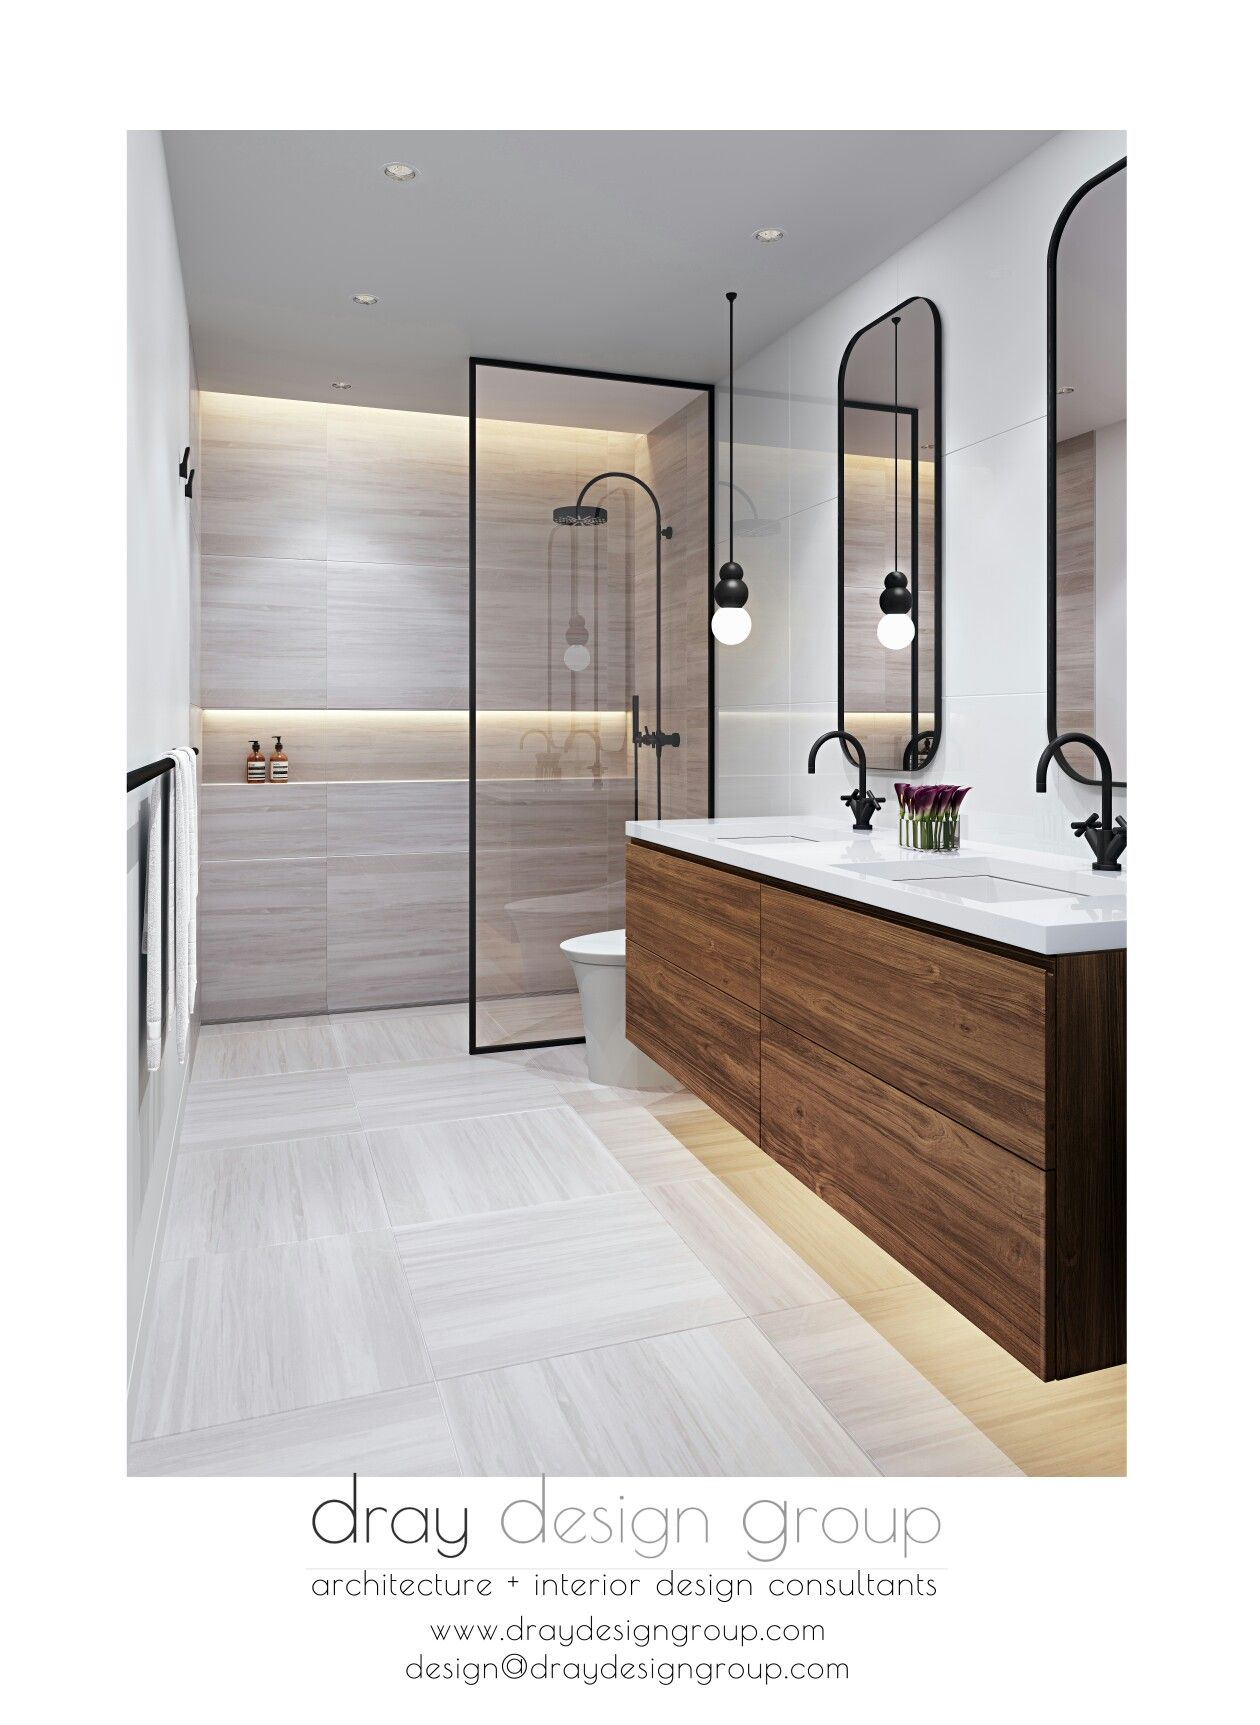 Miami Shores Residence Bathroom Renovation Warm Walnut Custom Vanity Balances The Clean Lin